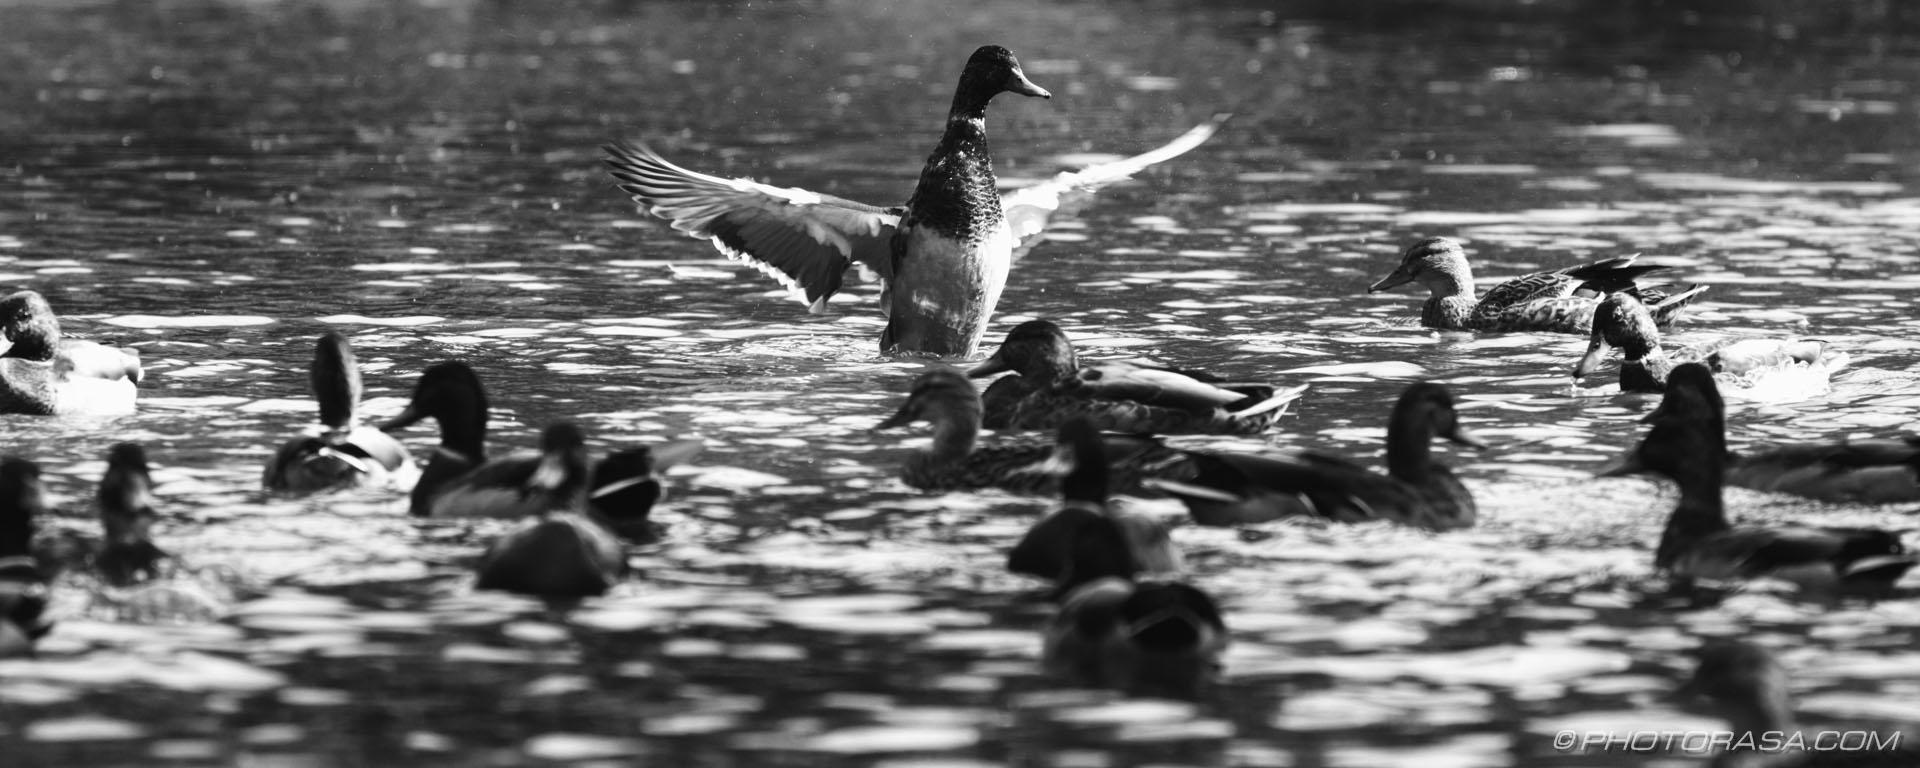 https://photorasa.com/mallard-ducks/duck-conducting/